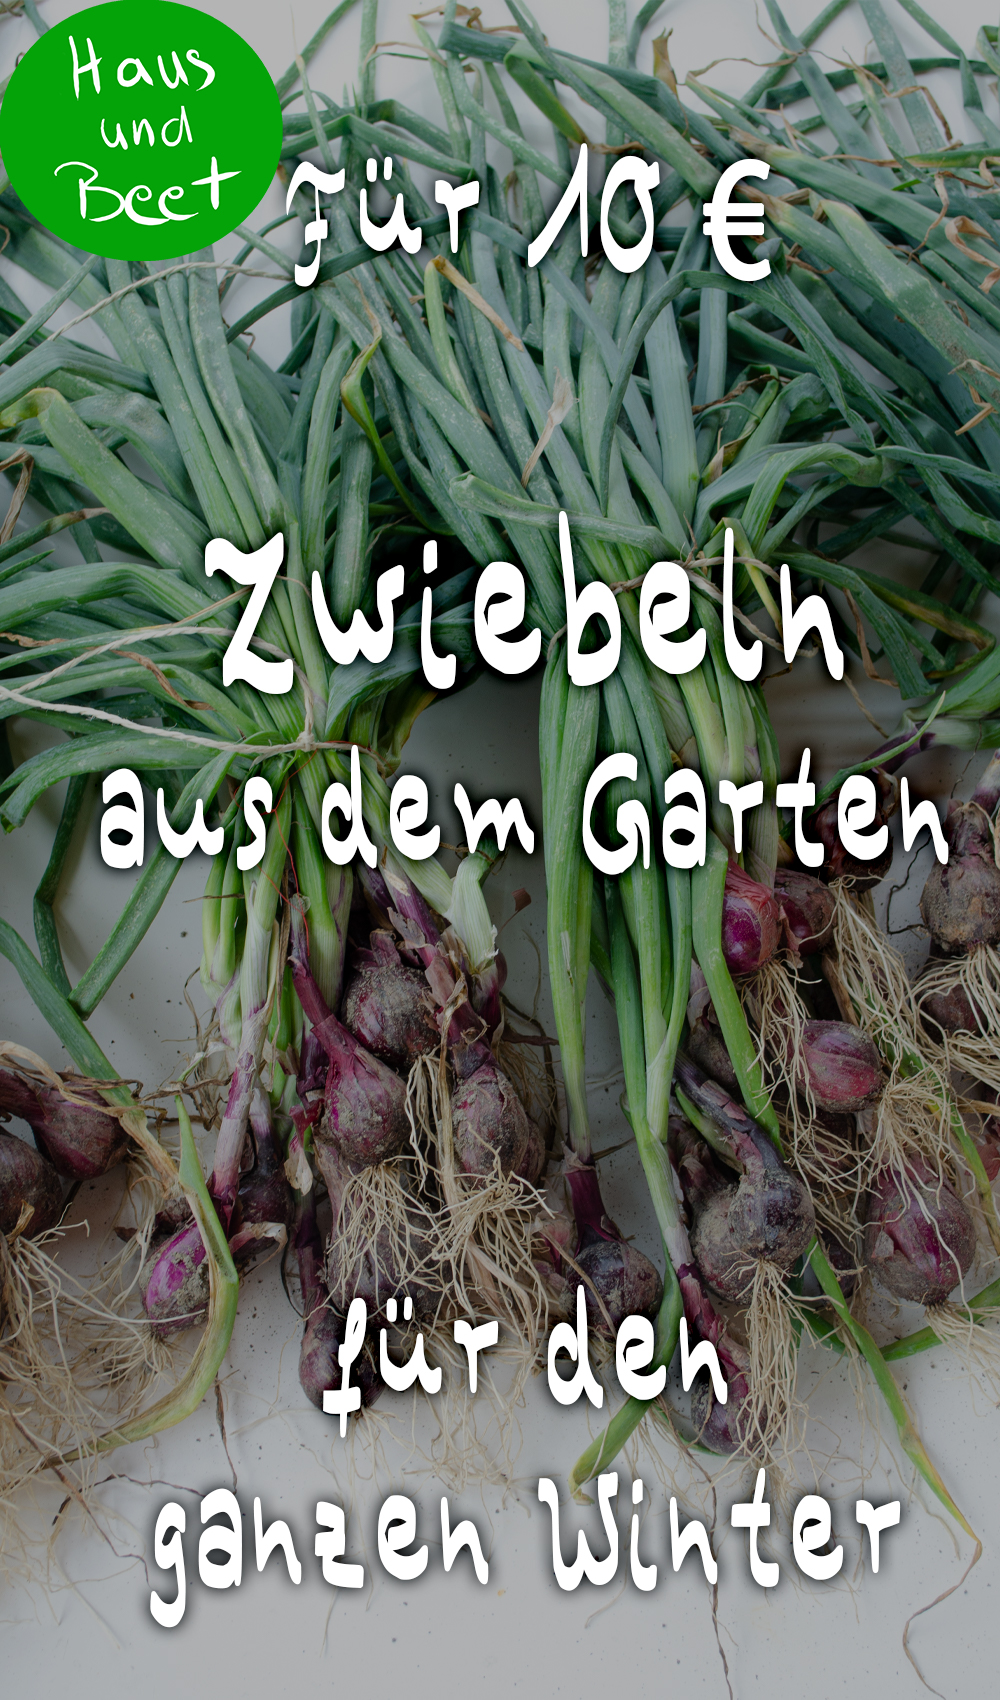 Zwiebel Anbauen Schritt Fur Schritt Anleitung Haus Und Beet Zwiebel Pflanzen Gemusegarten Anlegen Gemusebeet